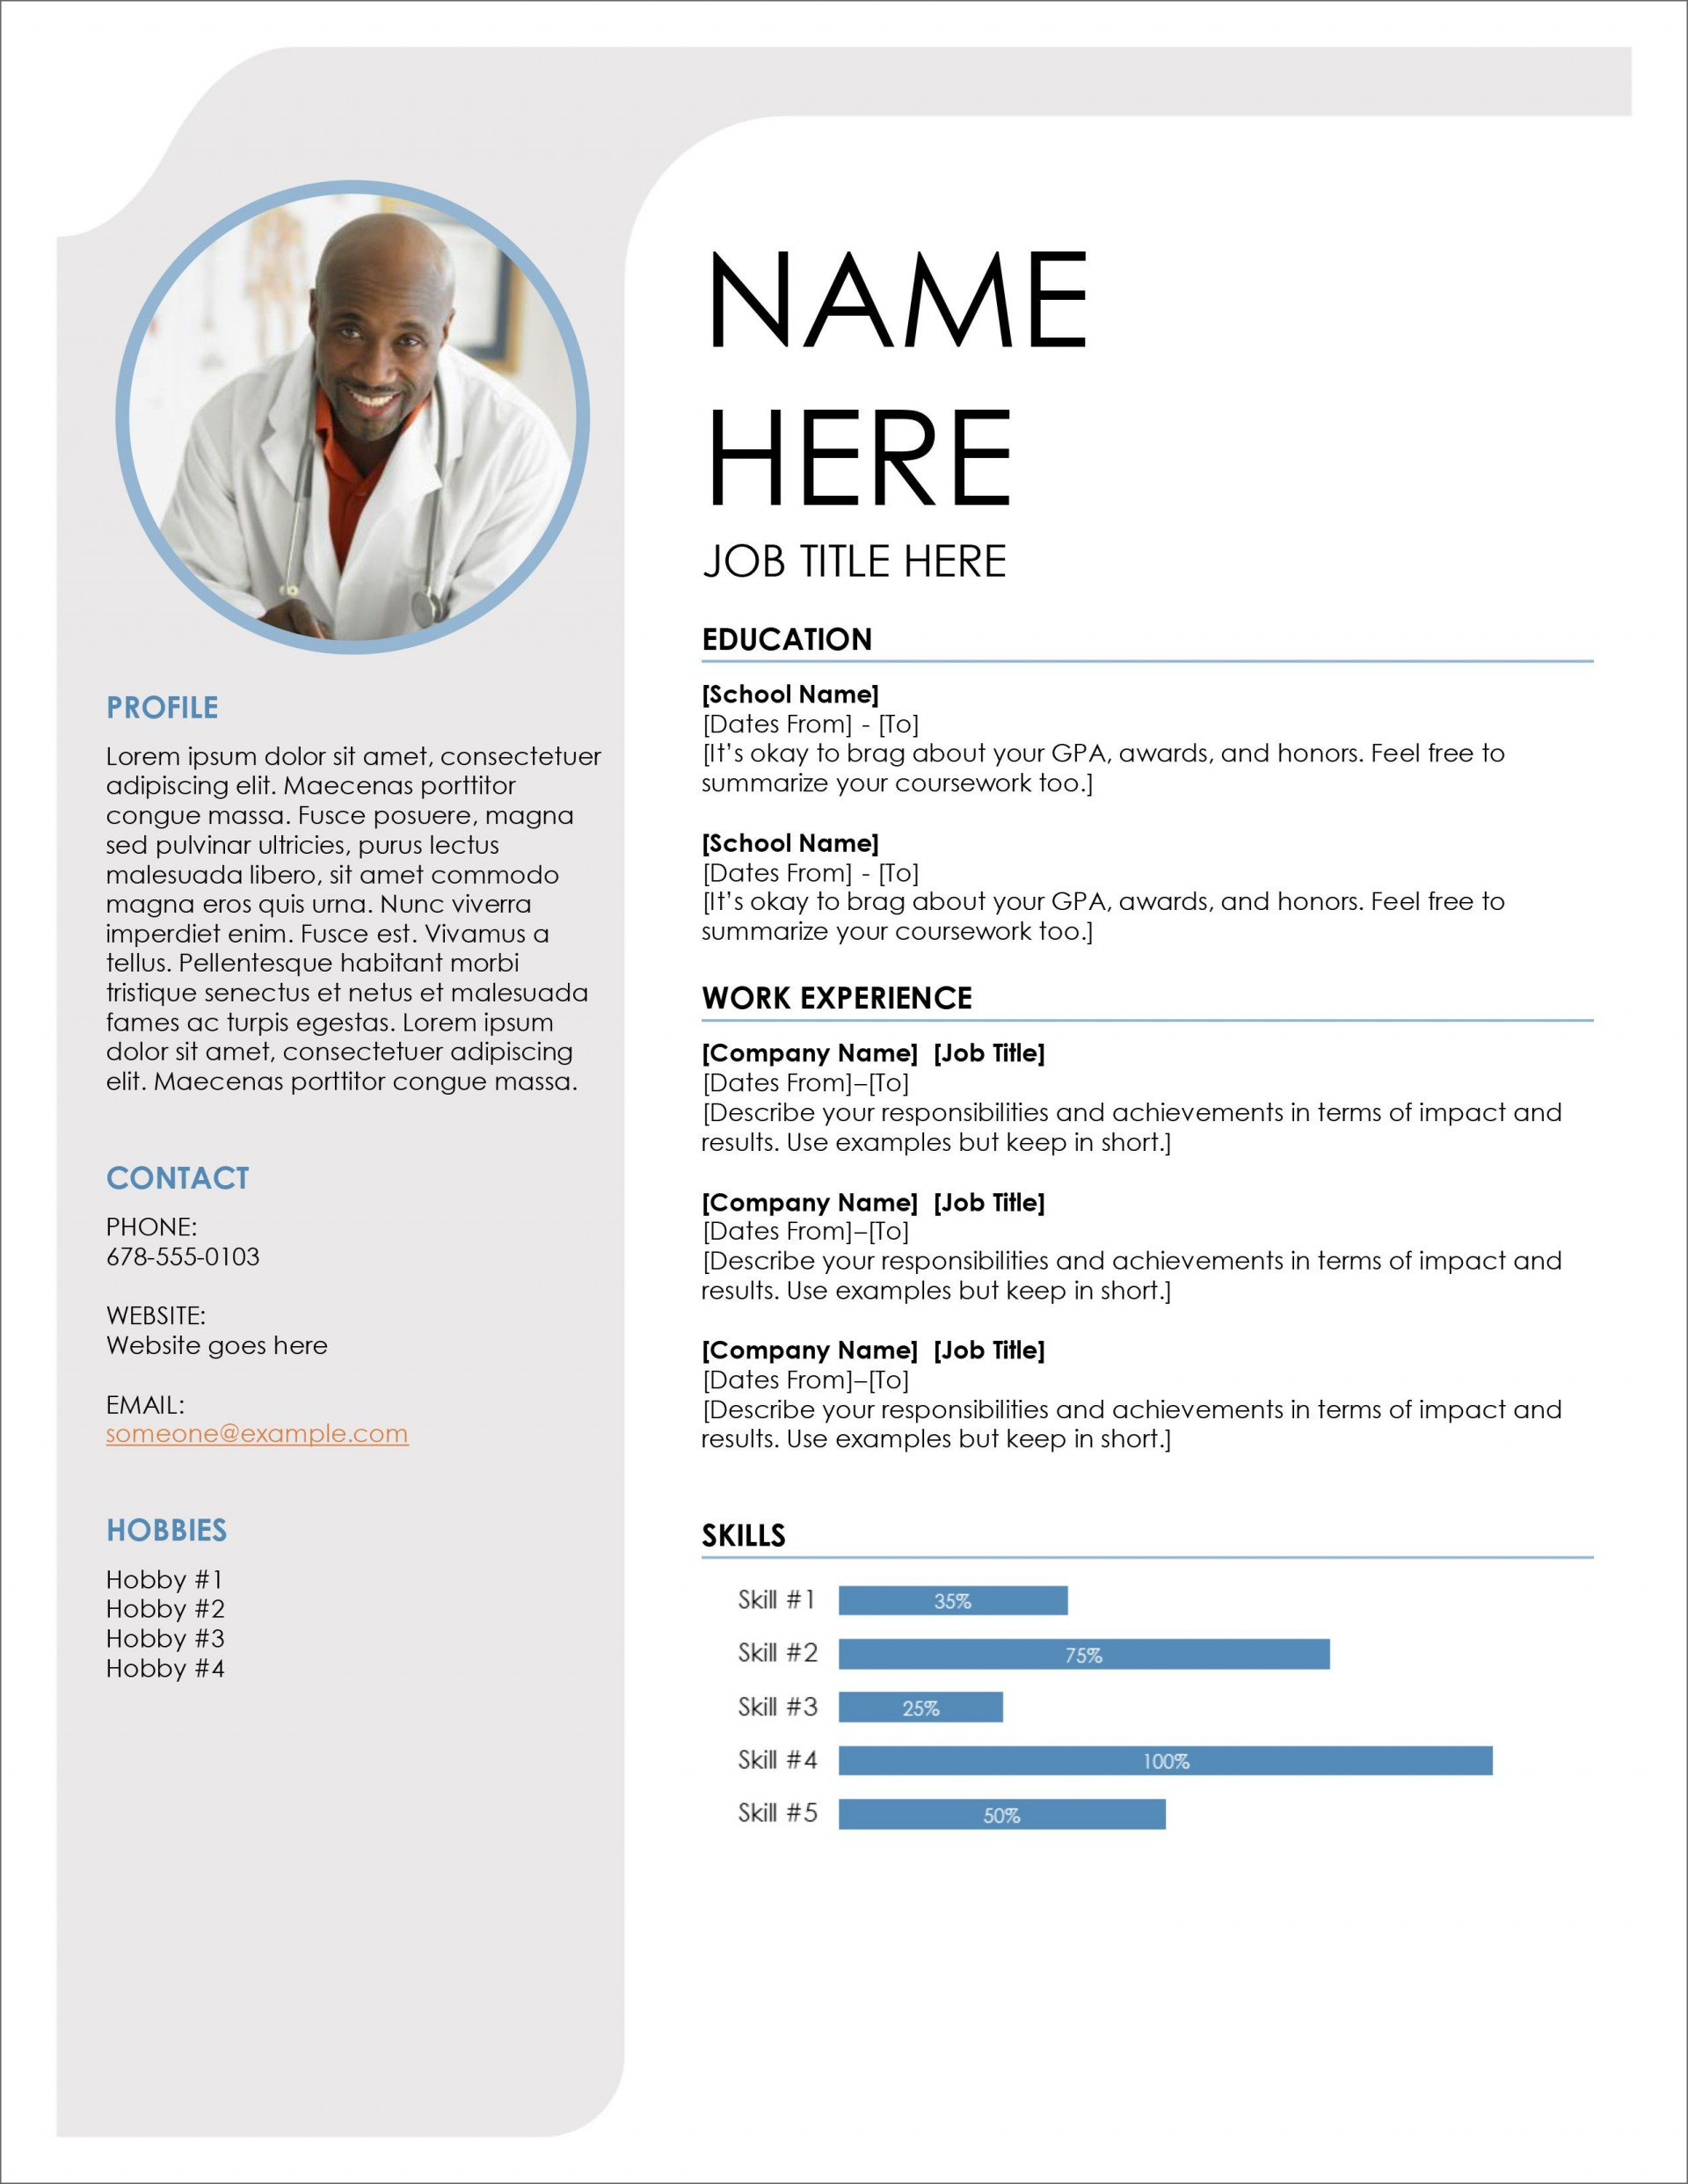 008 Impressive Cv Resume Word Template Free Download High Def  Curriculum Vitae1920